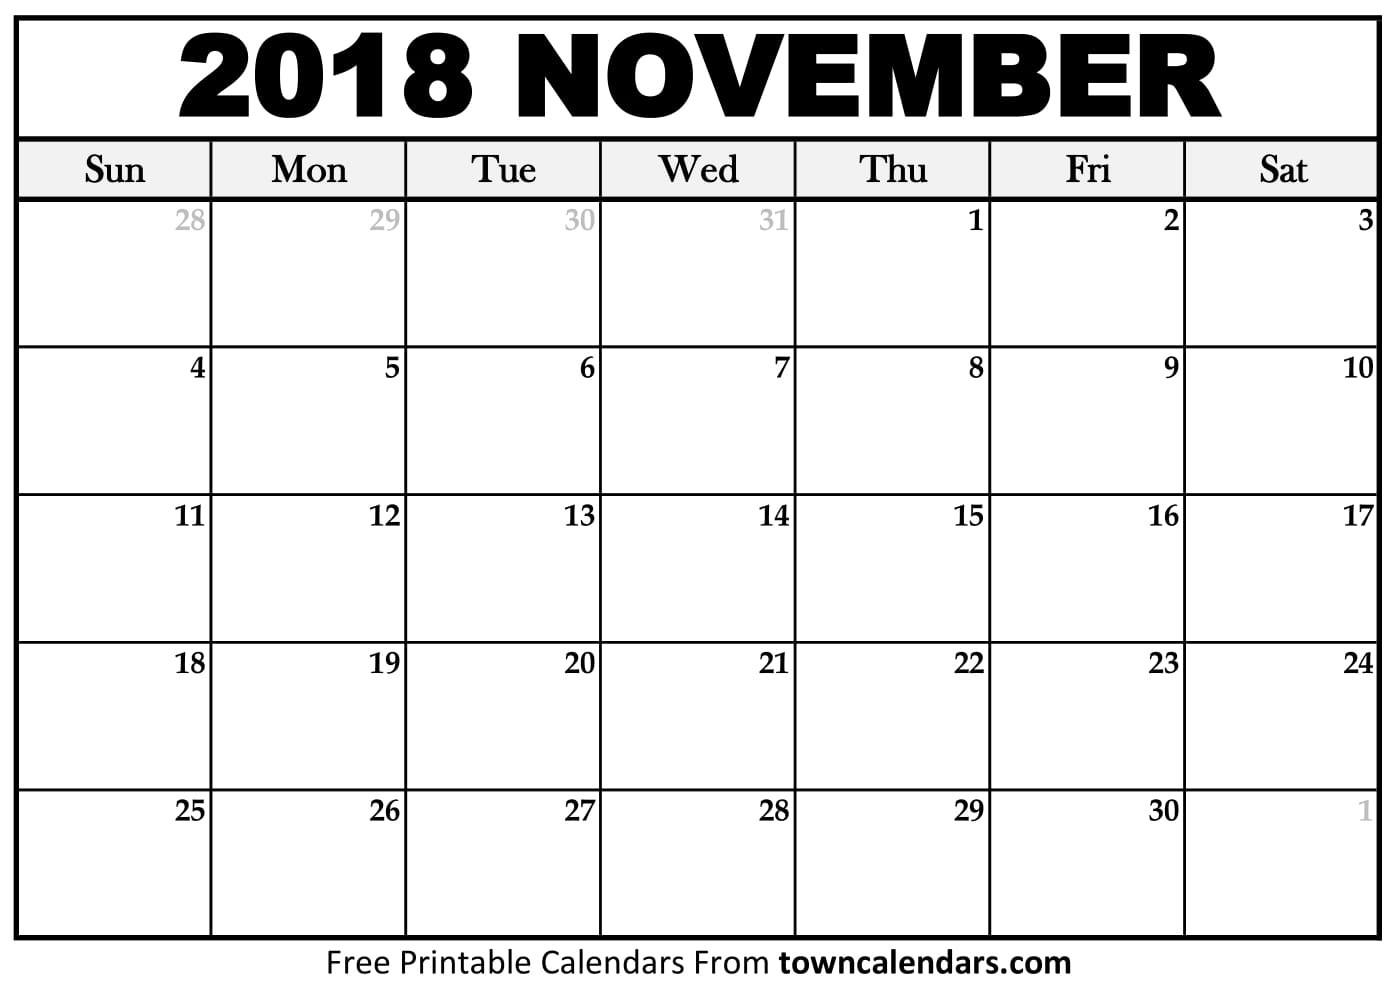 Printable November 2018 Calendar towncalendars